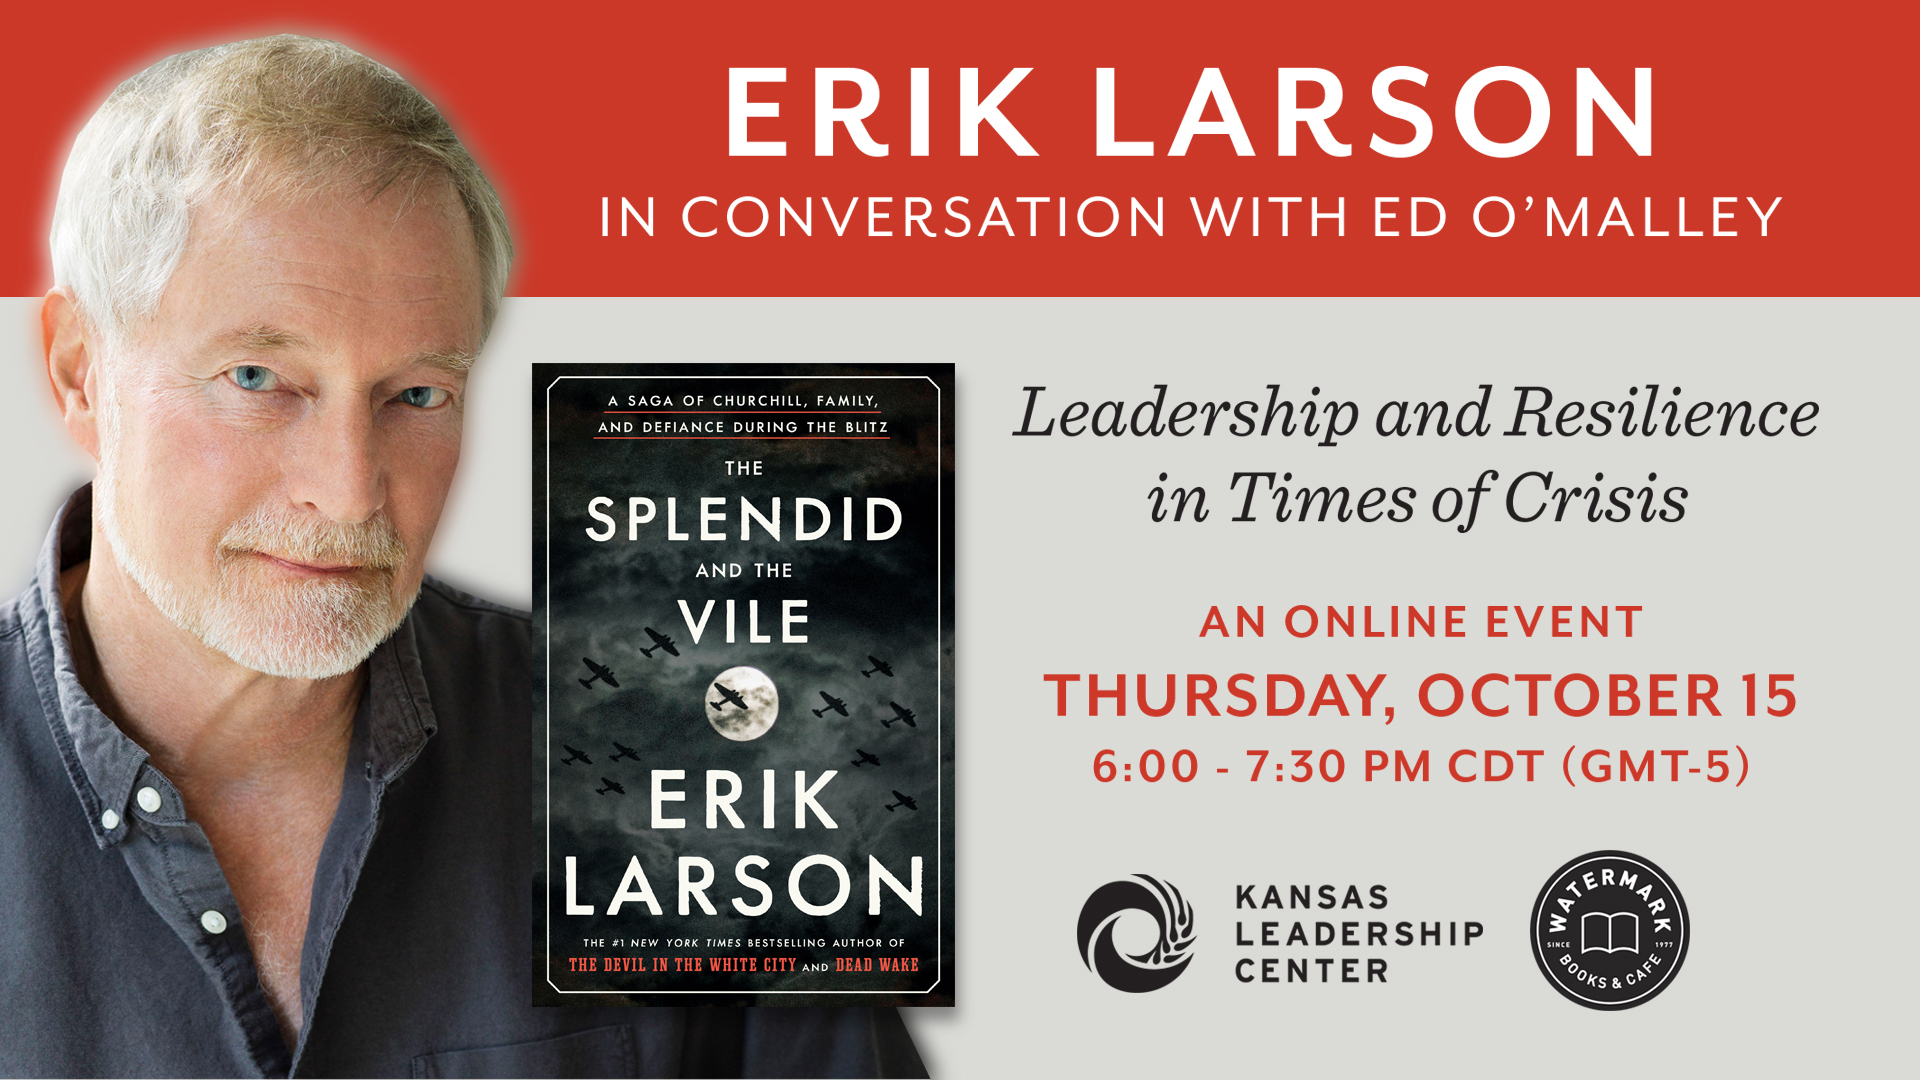 Erik Larson and Ed O'Malley